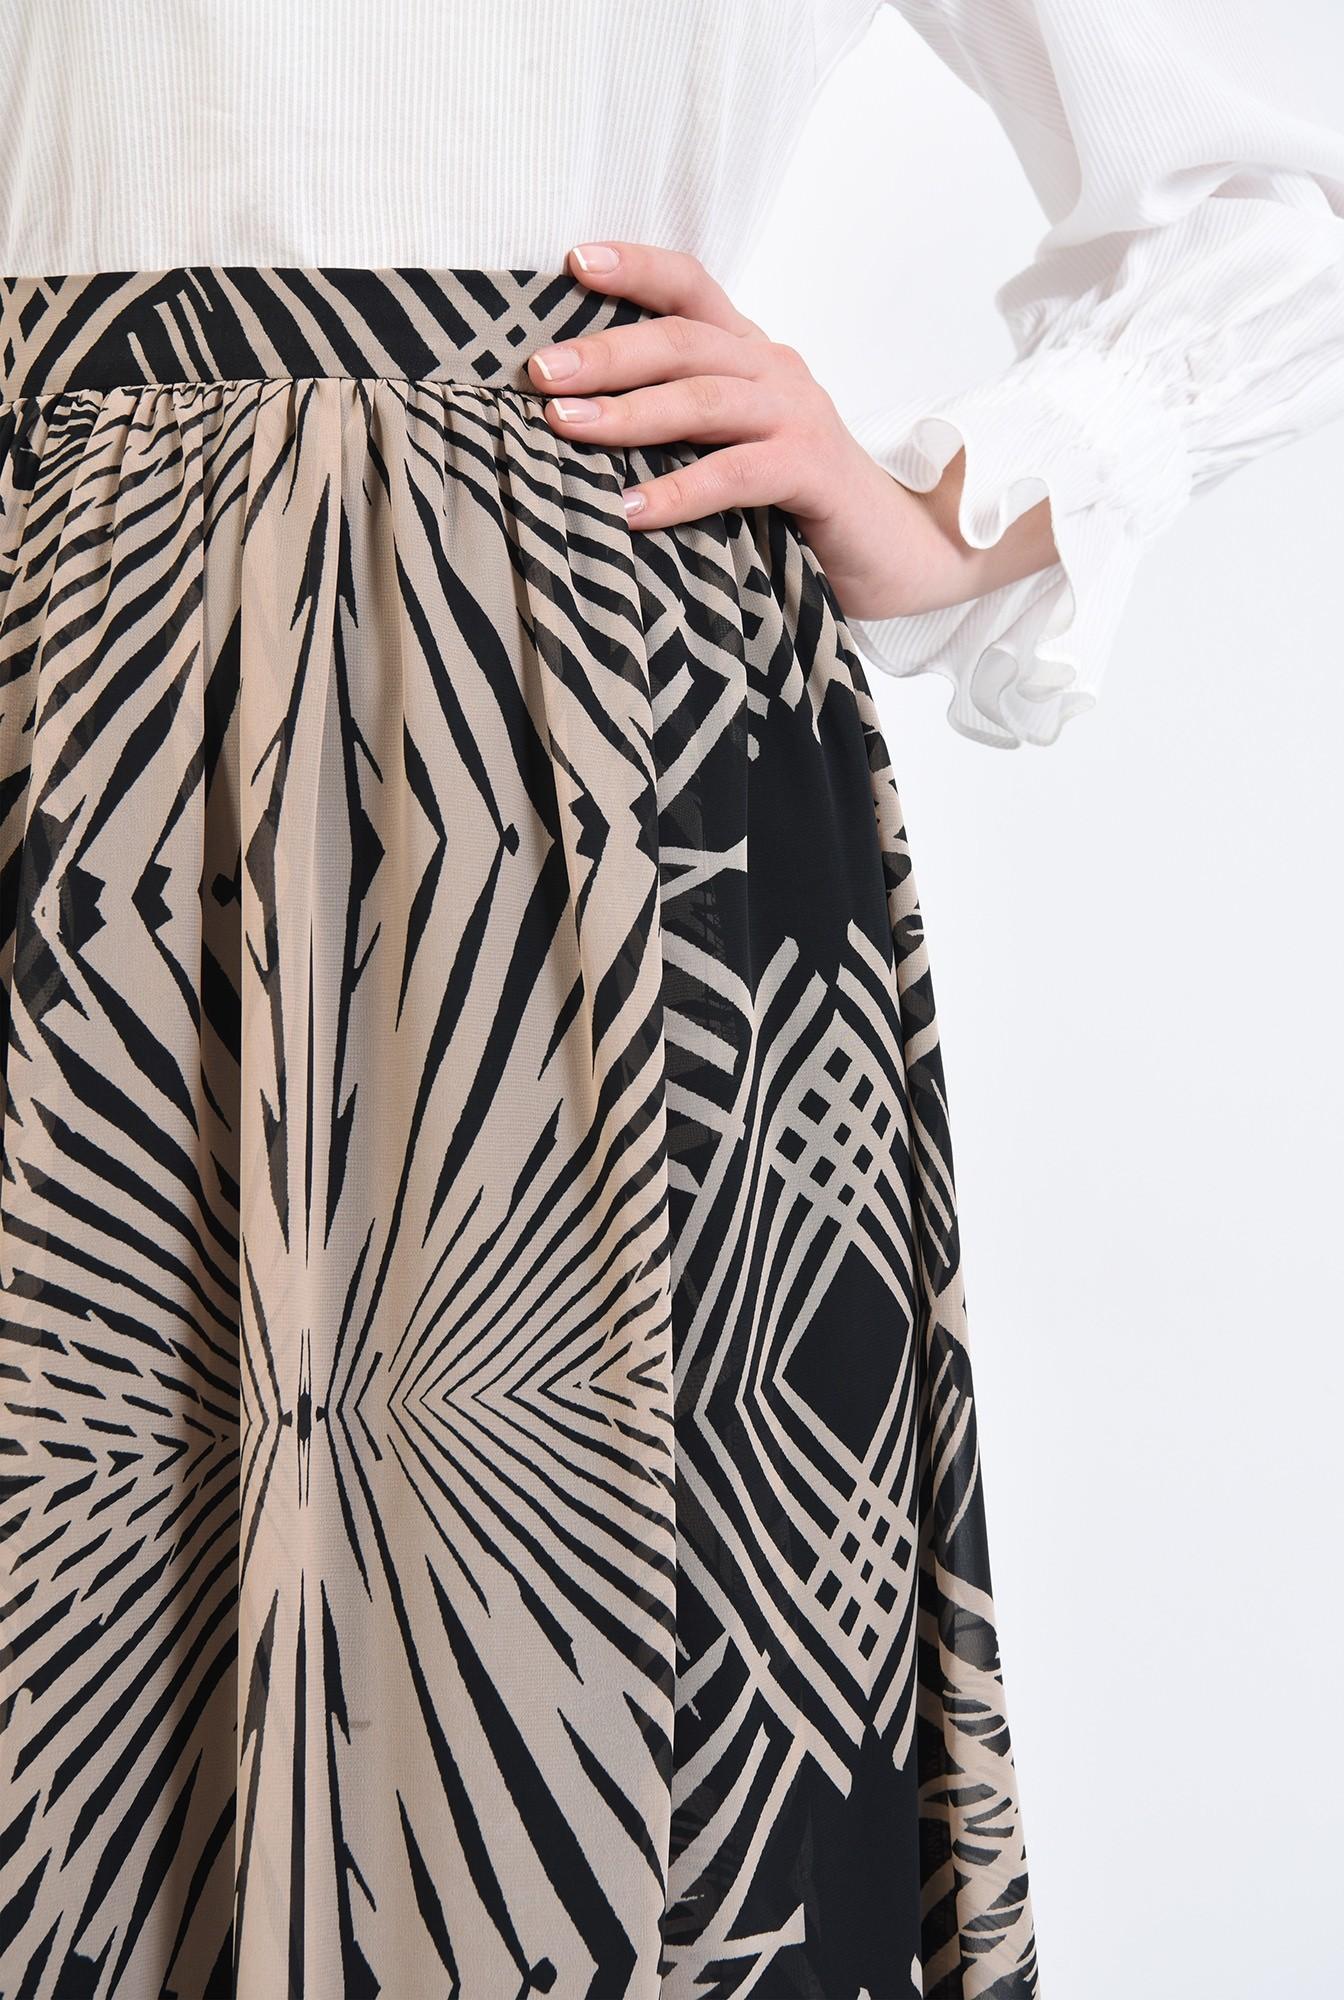 2 - 360 - fusta casual, midi, evazata, cu talie inalta, imprimeu abstract